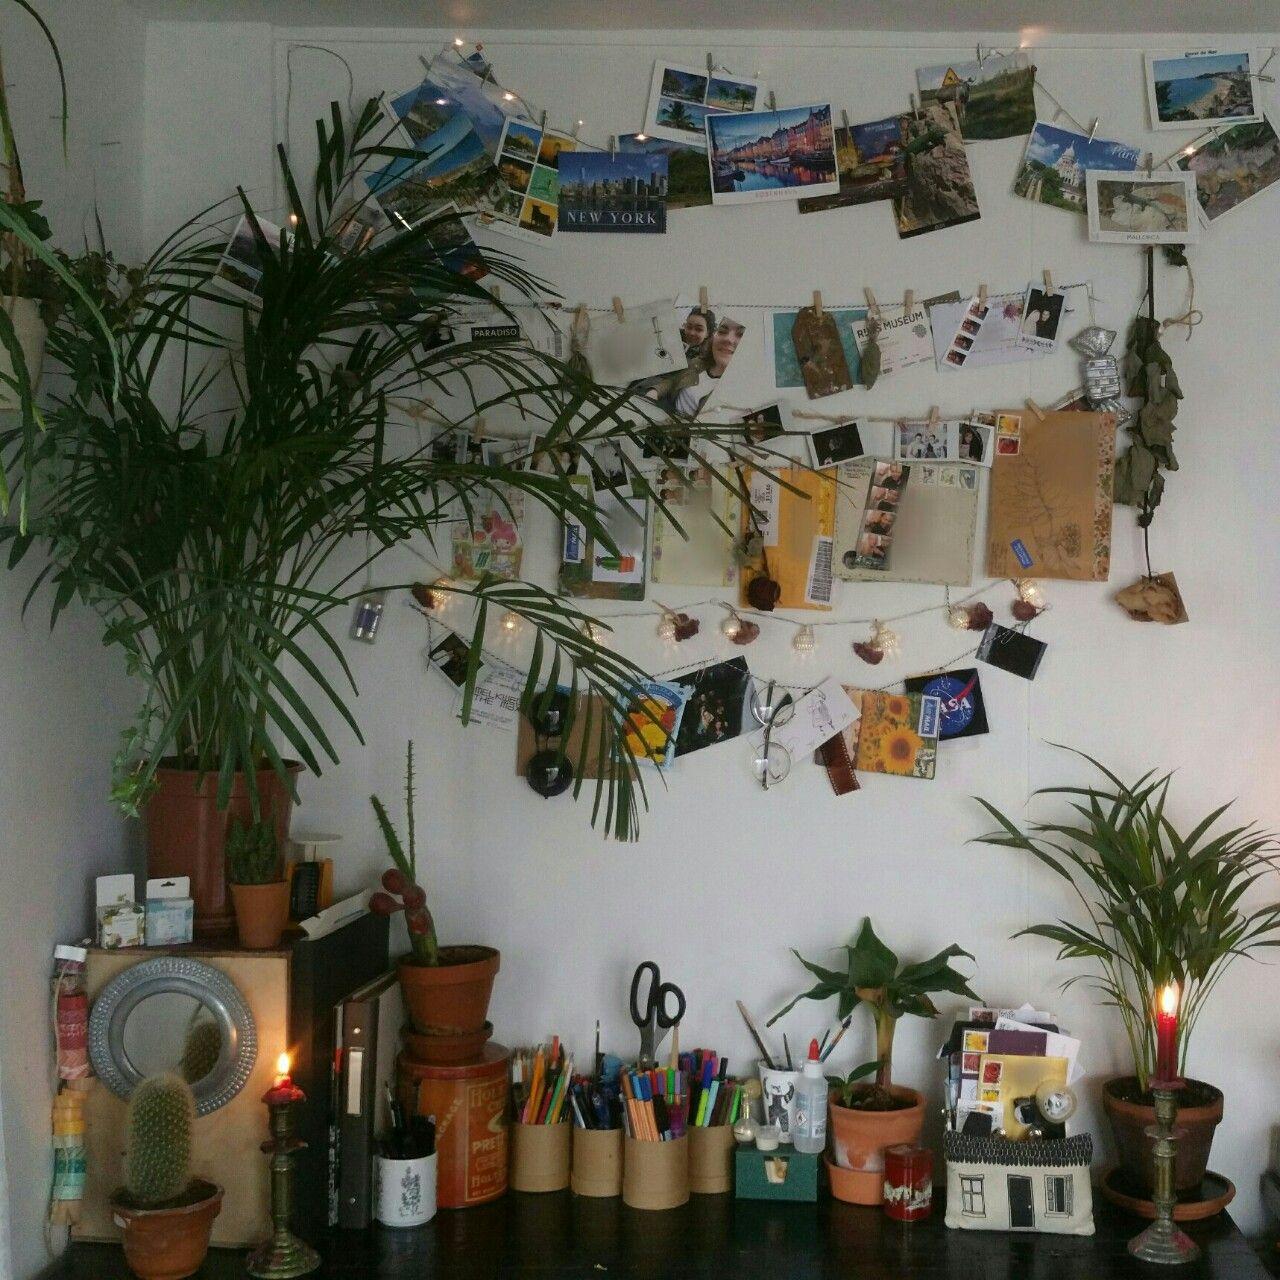 Aisha an 8 yr old 10 cute stuff art stuff ig for Room decor ideas grunge